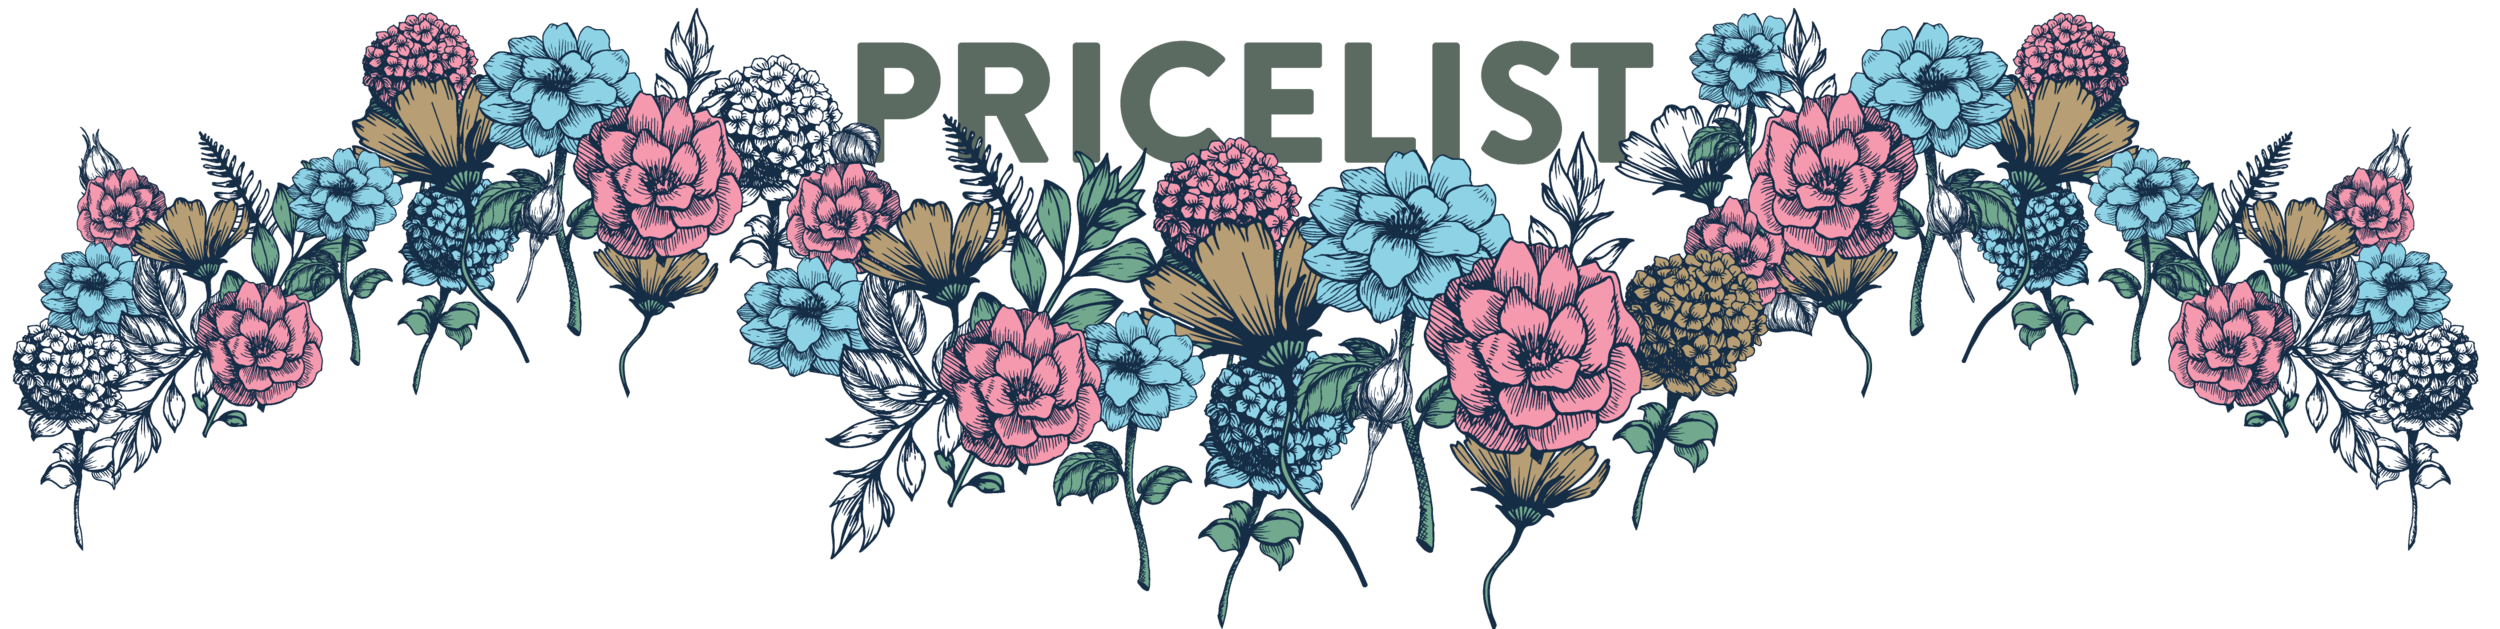 Garden-Room-hair-leyton-hairdresser-flower-pricelist.png